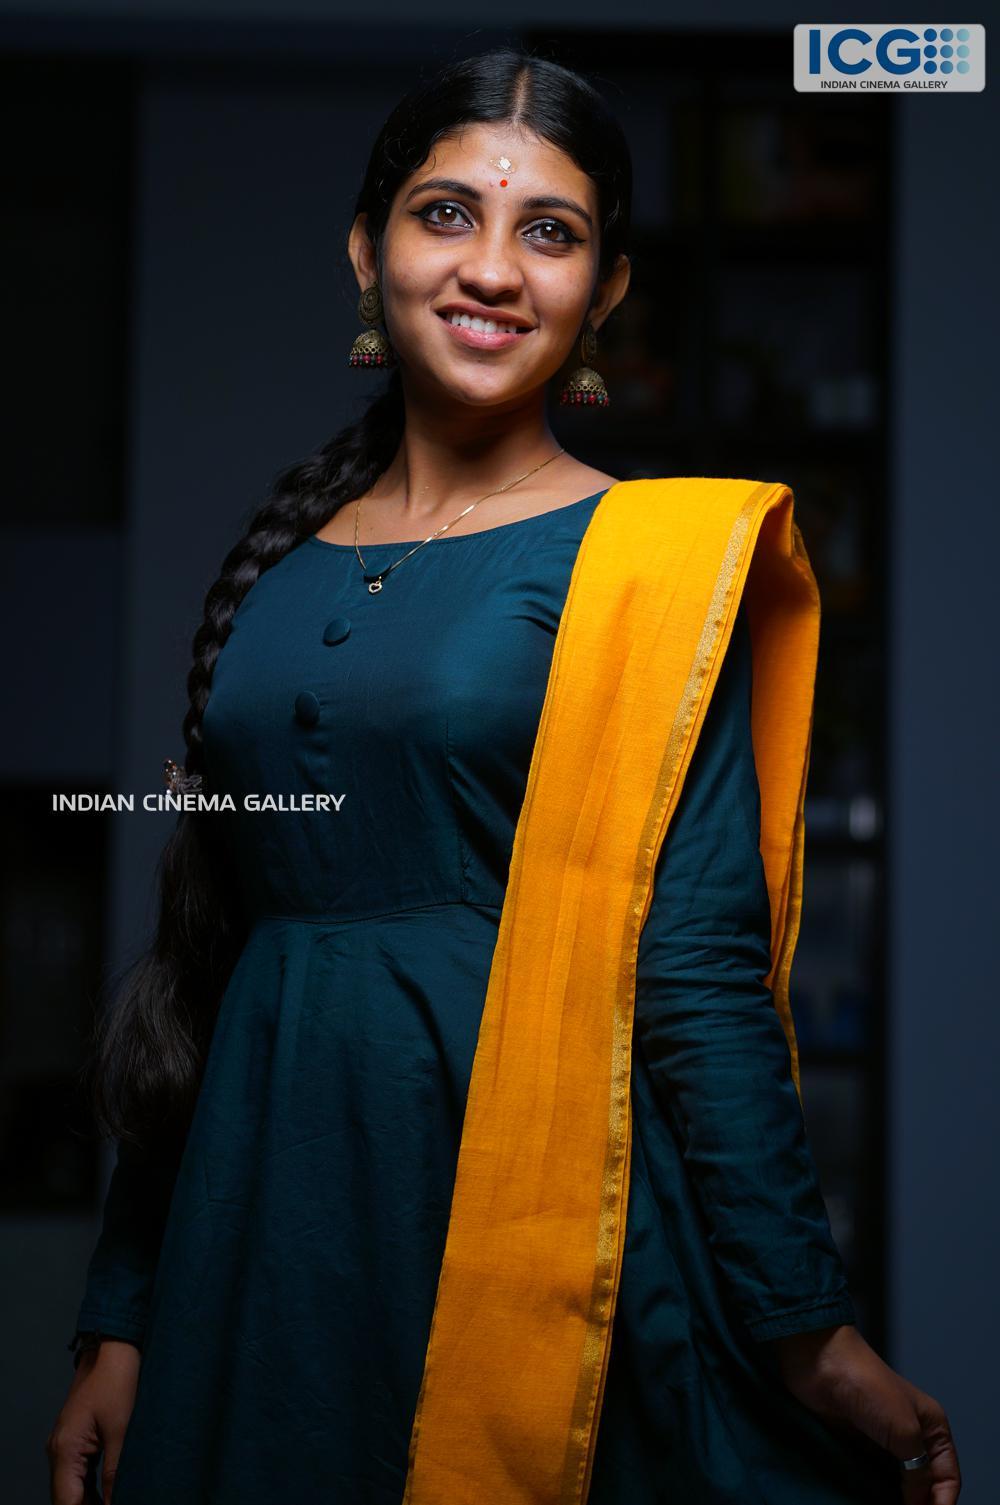 Vaishnava K Sunil stills (3)